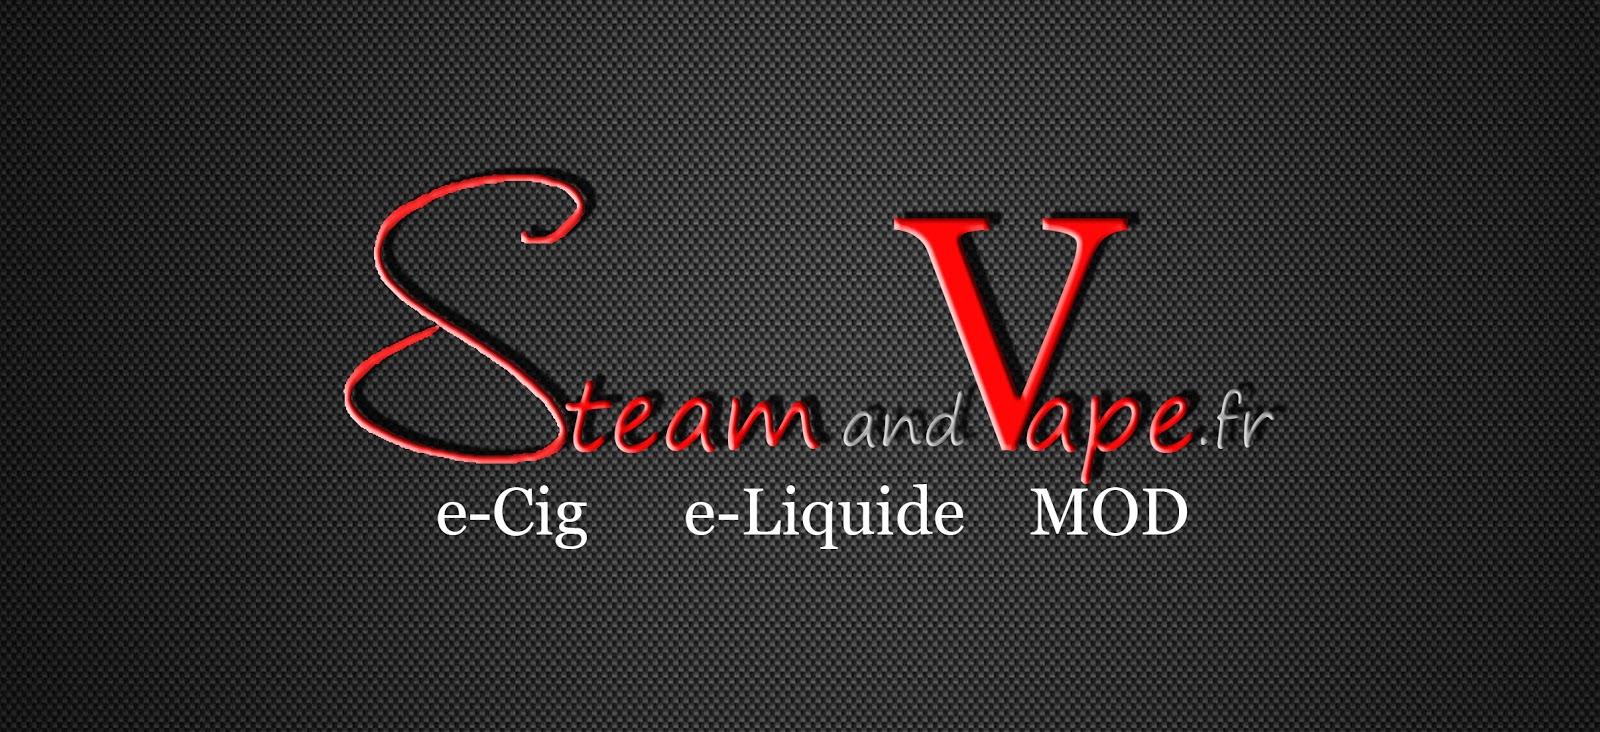 Steam and Vape